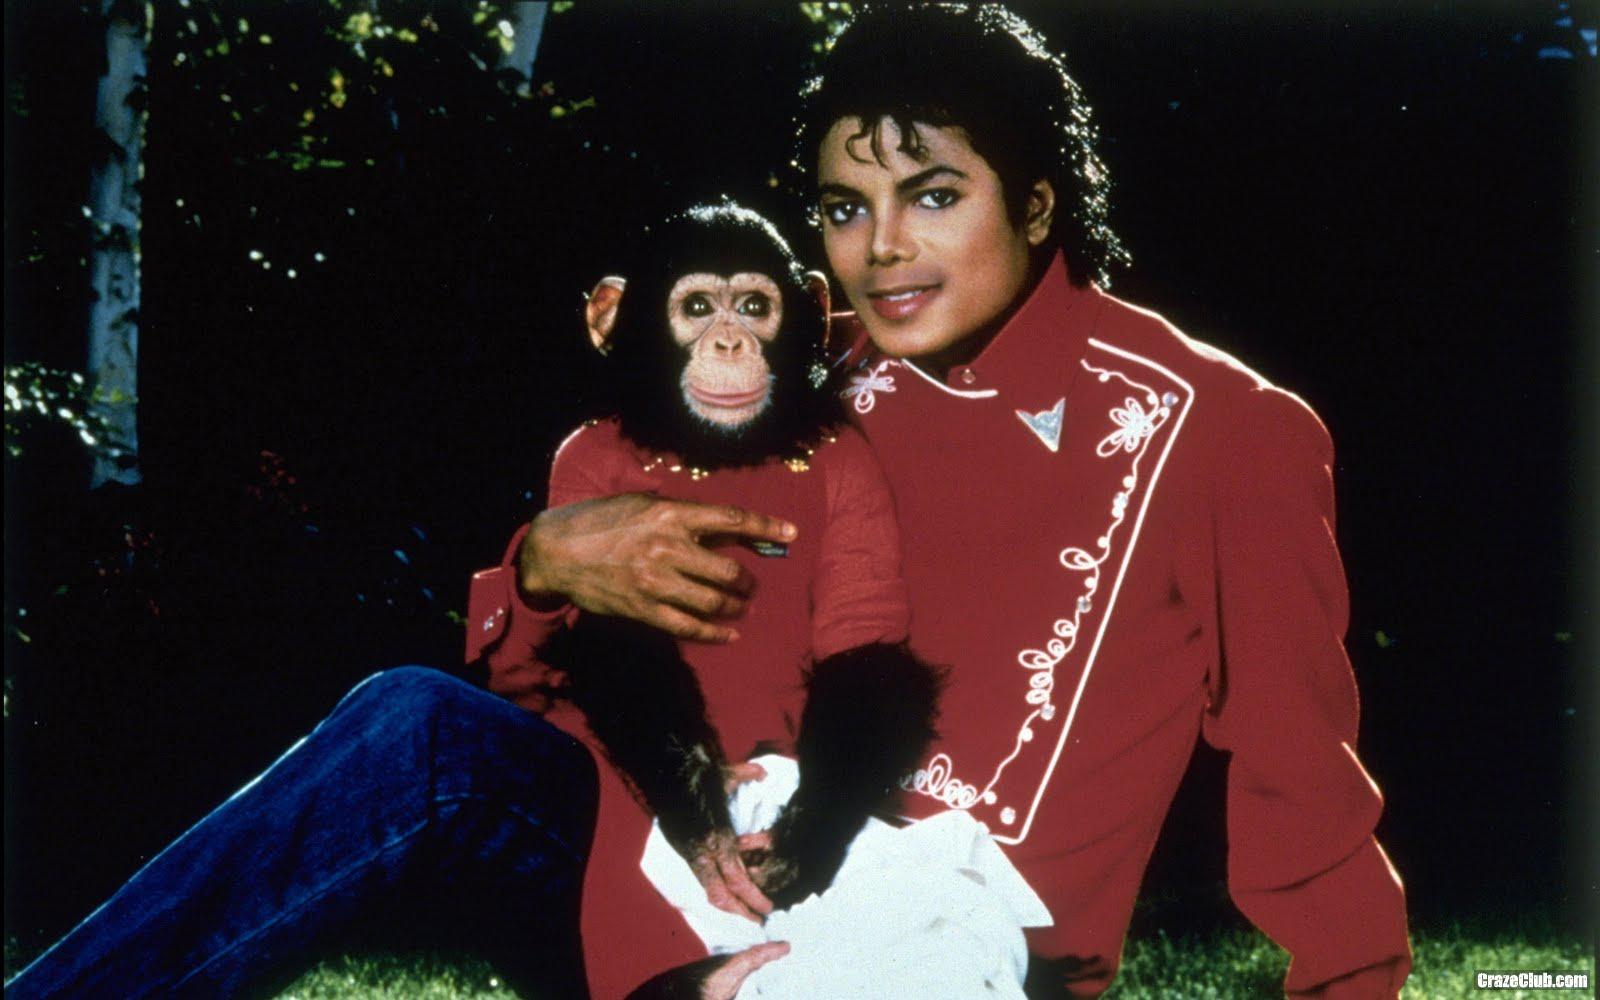 http://2.bp.blogspot.com/_c72kc4JbsgY/TOFFx_KoKAI/AAAAAAAAENA/k_kTW6A43o4/s1600/Michael+Jackson+Wallpaper+%252824%2529.jpg